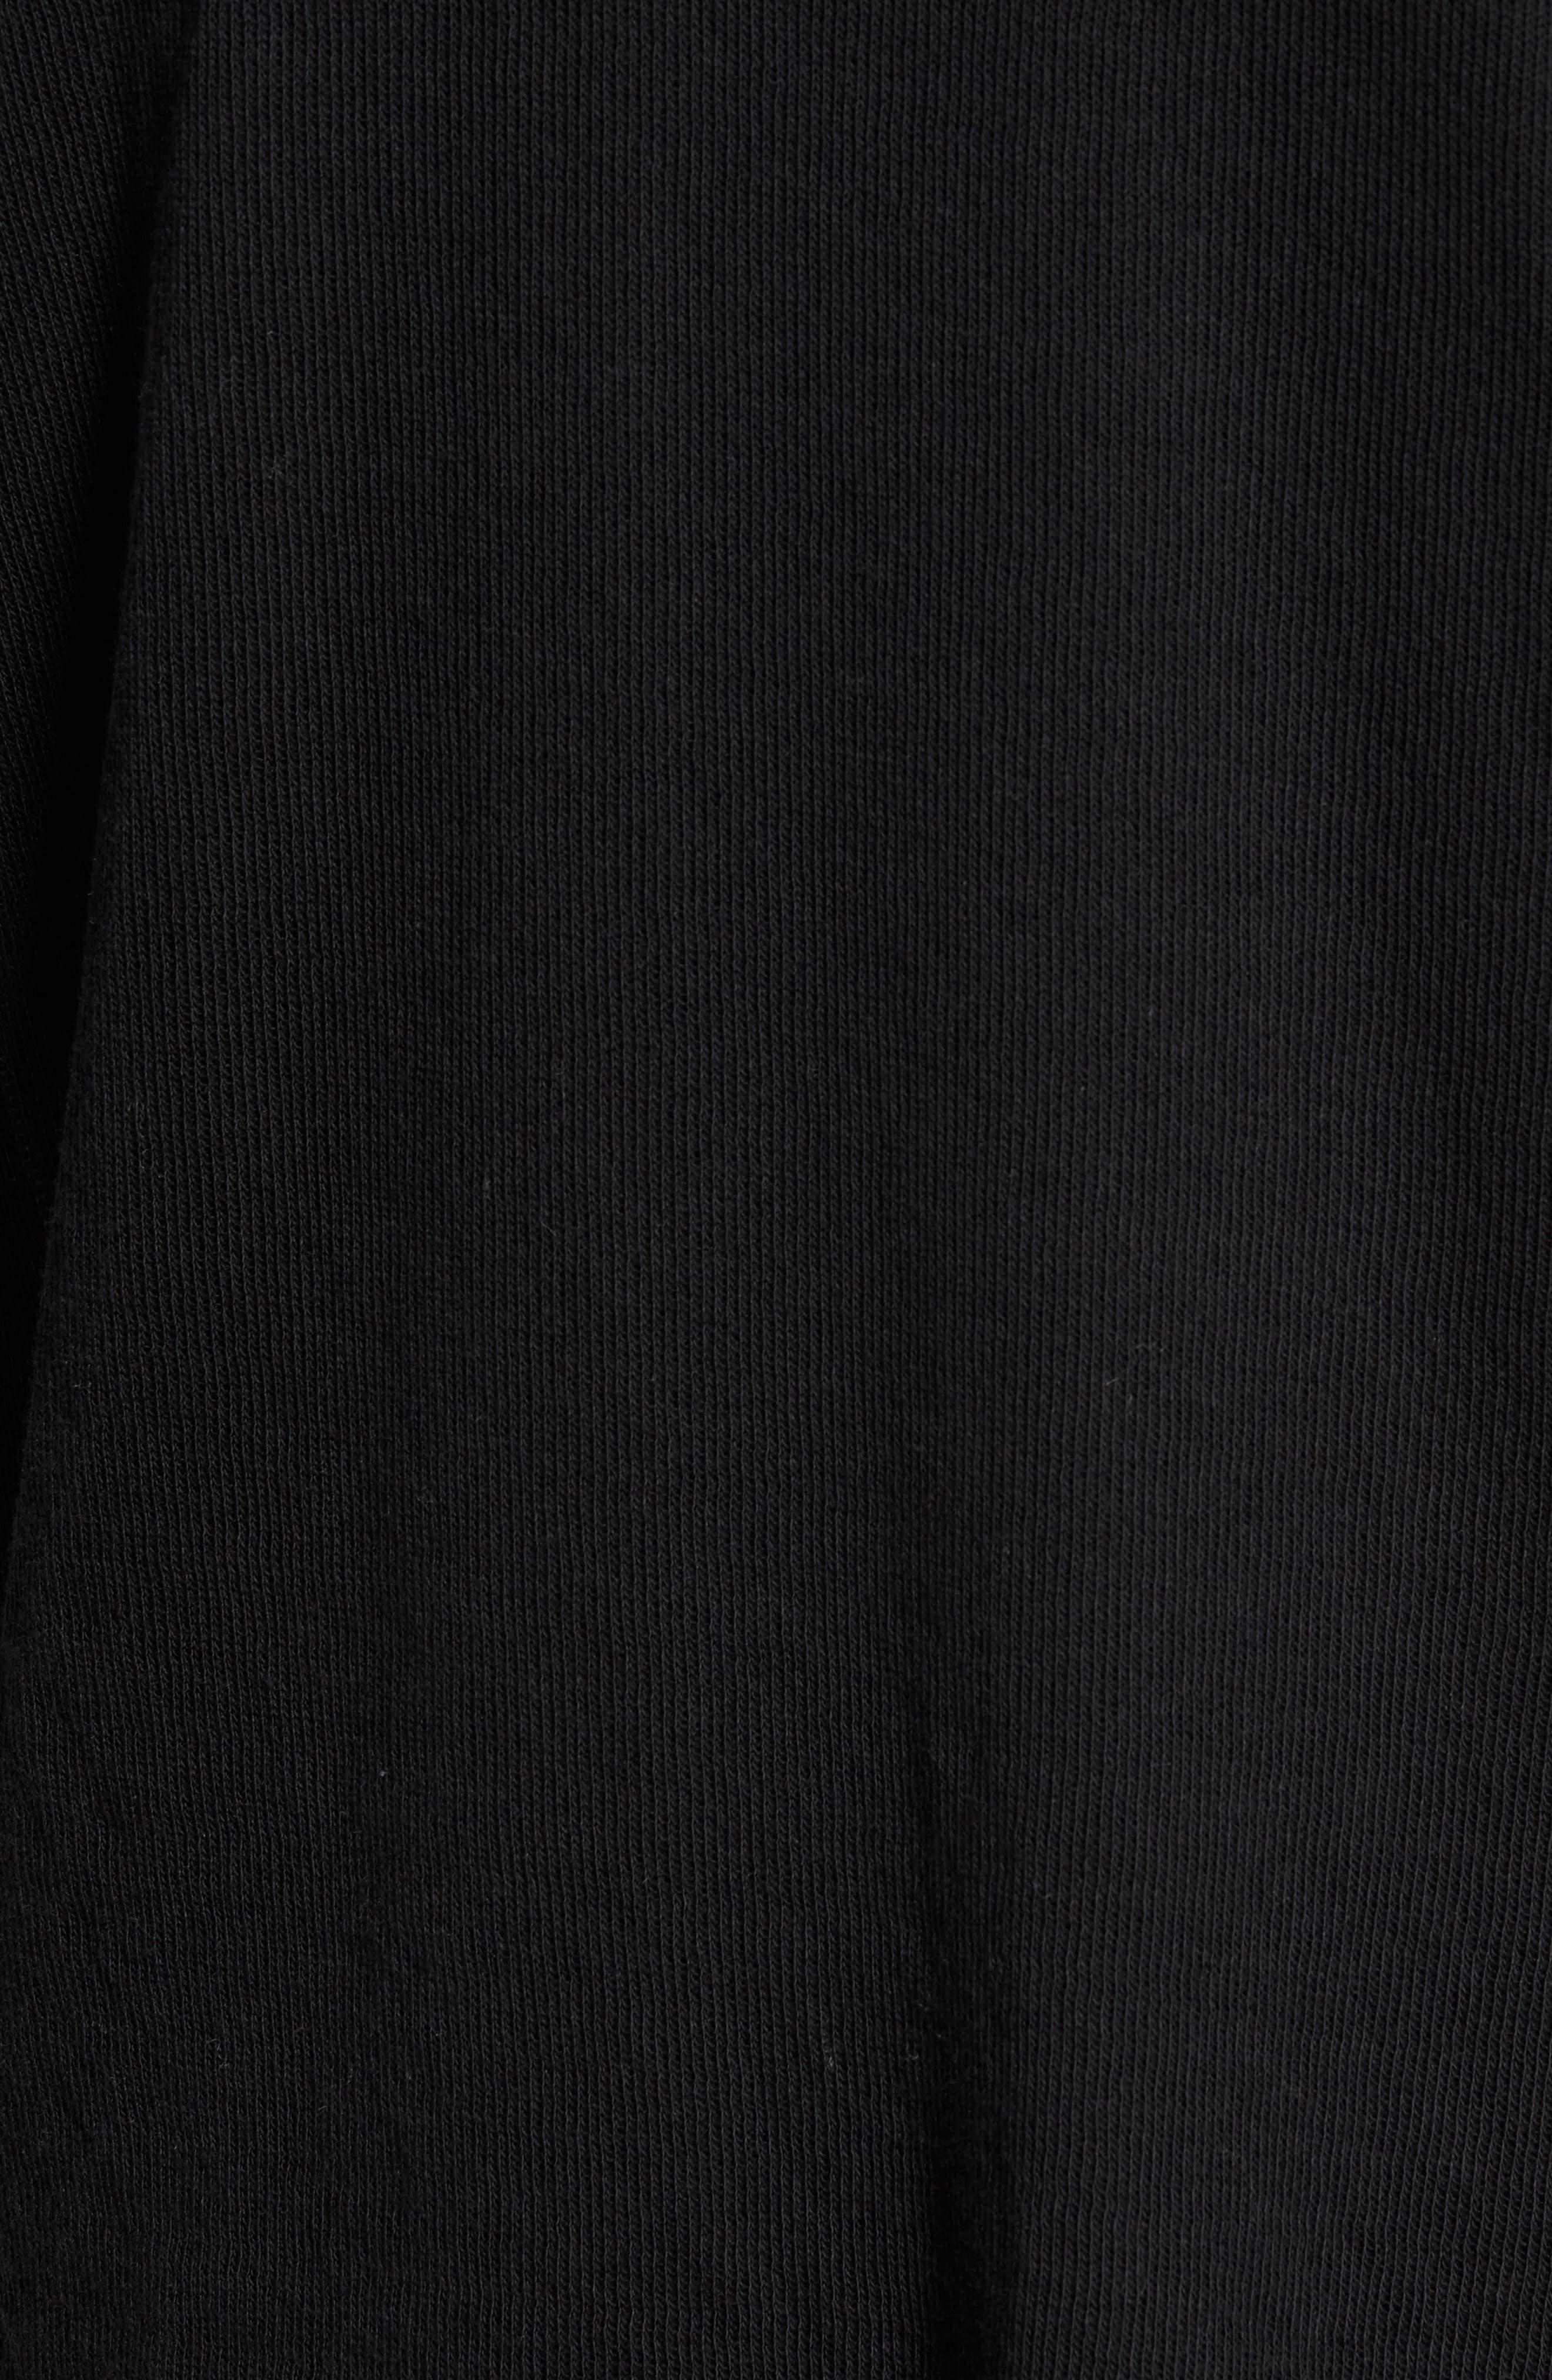 Double Knit Long Sleeve T-Shirt,                             Alternate thumbnail 5, color,                             BLACK